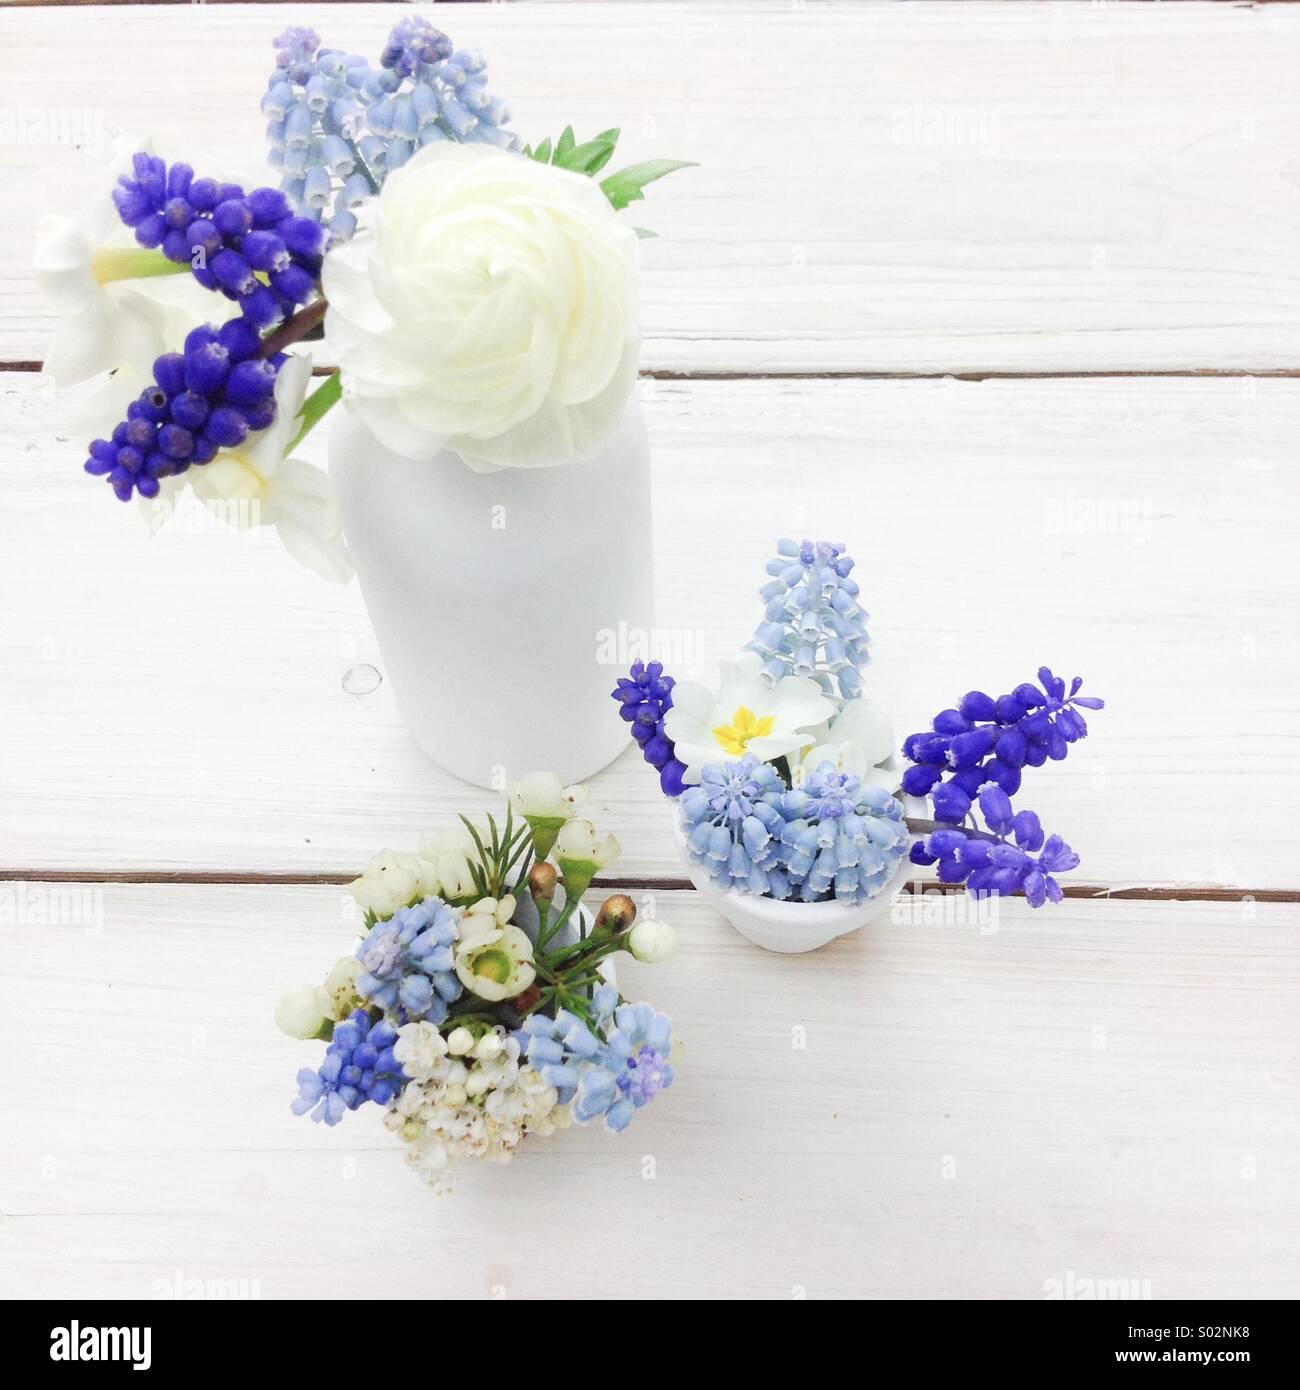 Three blue & white spring posies in white milk bottles. Blue grape hyacinths, narcissus, ranunculus, wax flowers. - Stock Image